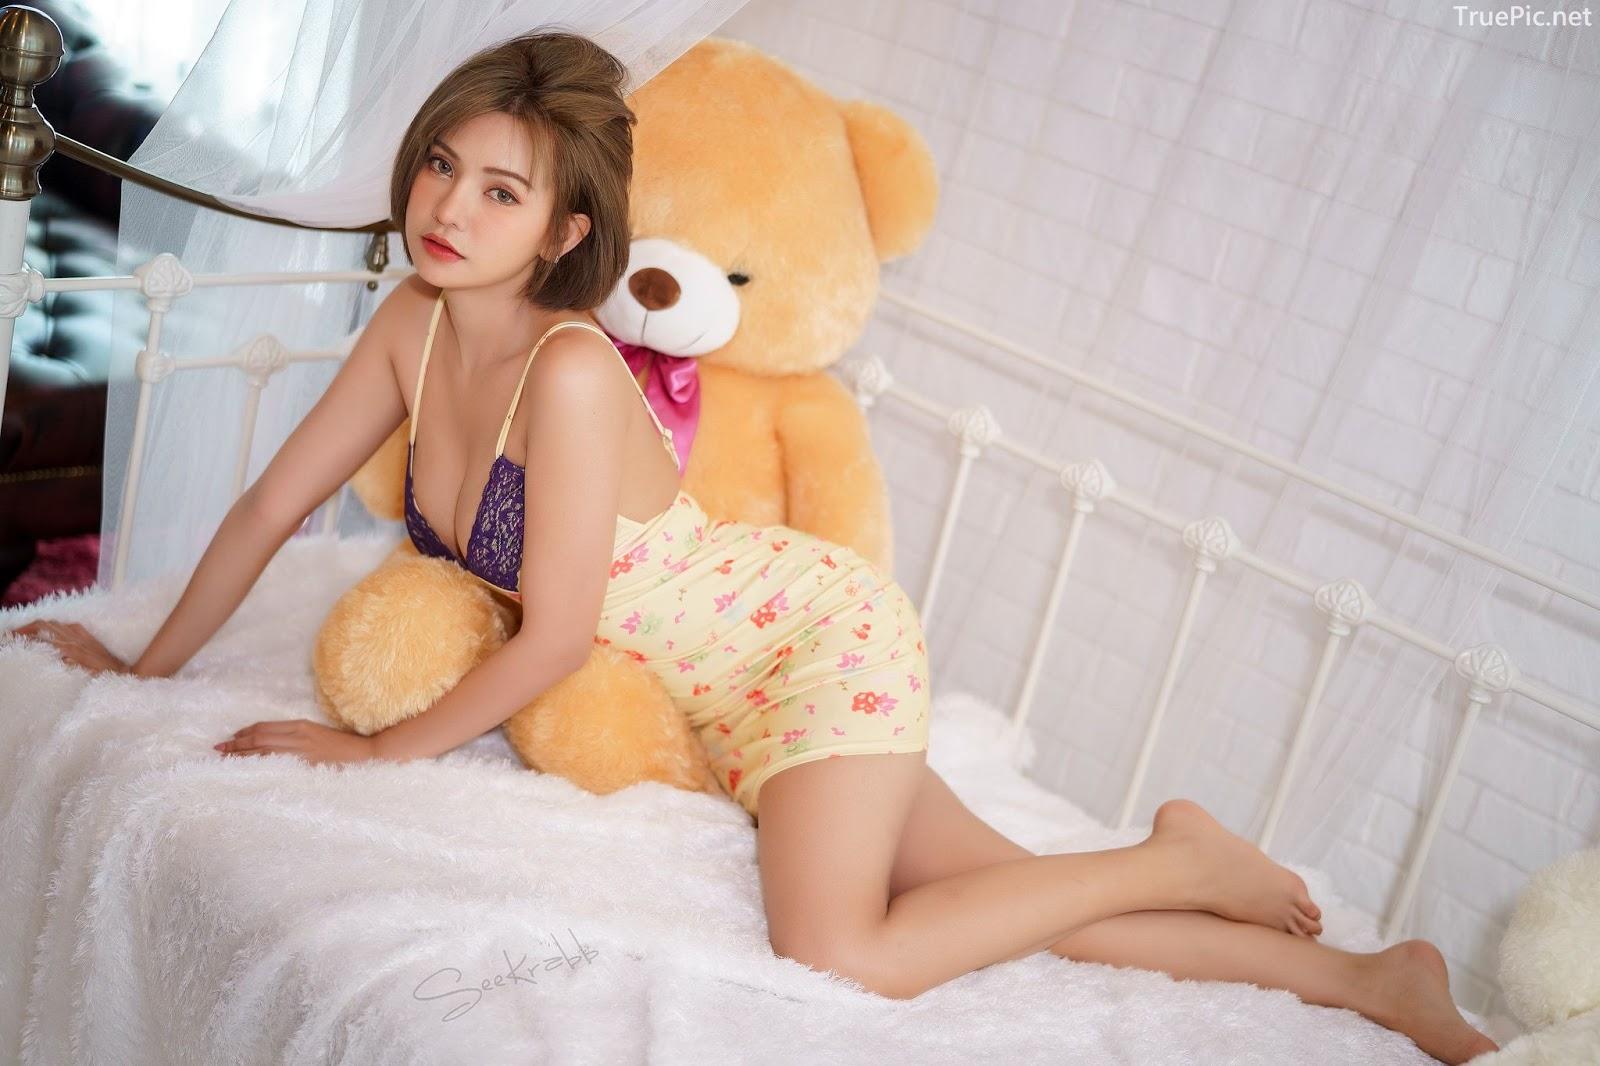 Thailand sexy model - Sutasinee Siriruke - Sleepwear and Lingerie Set - TruePic.net - Picture 6